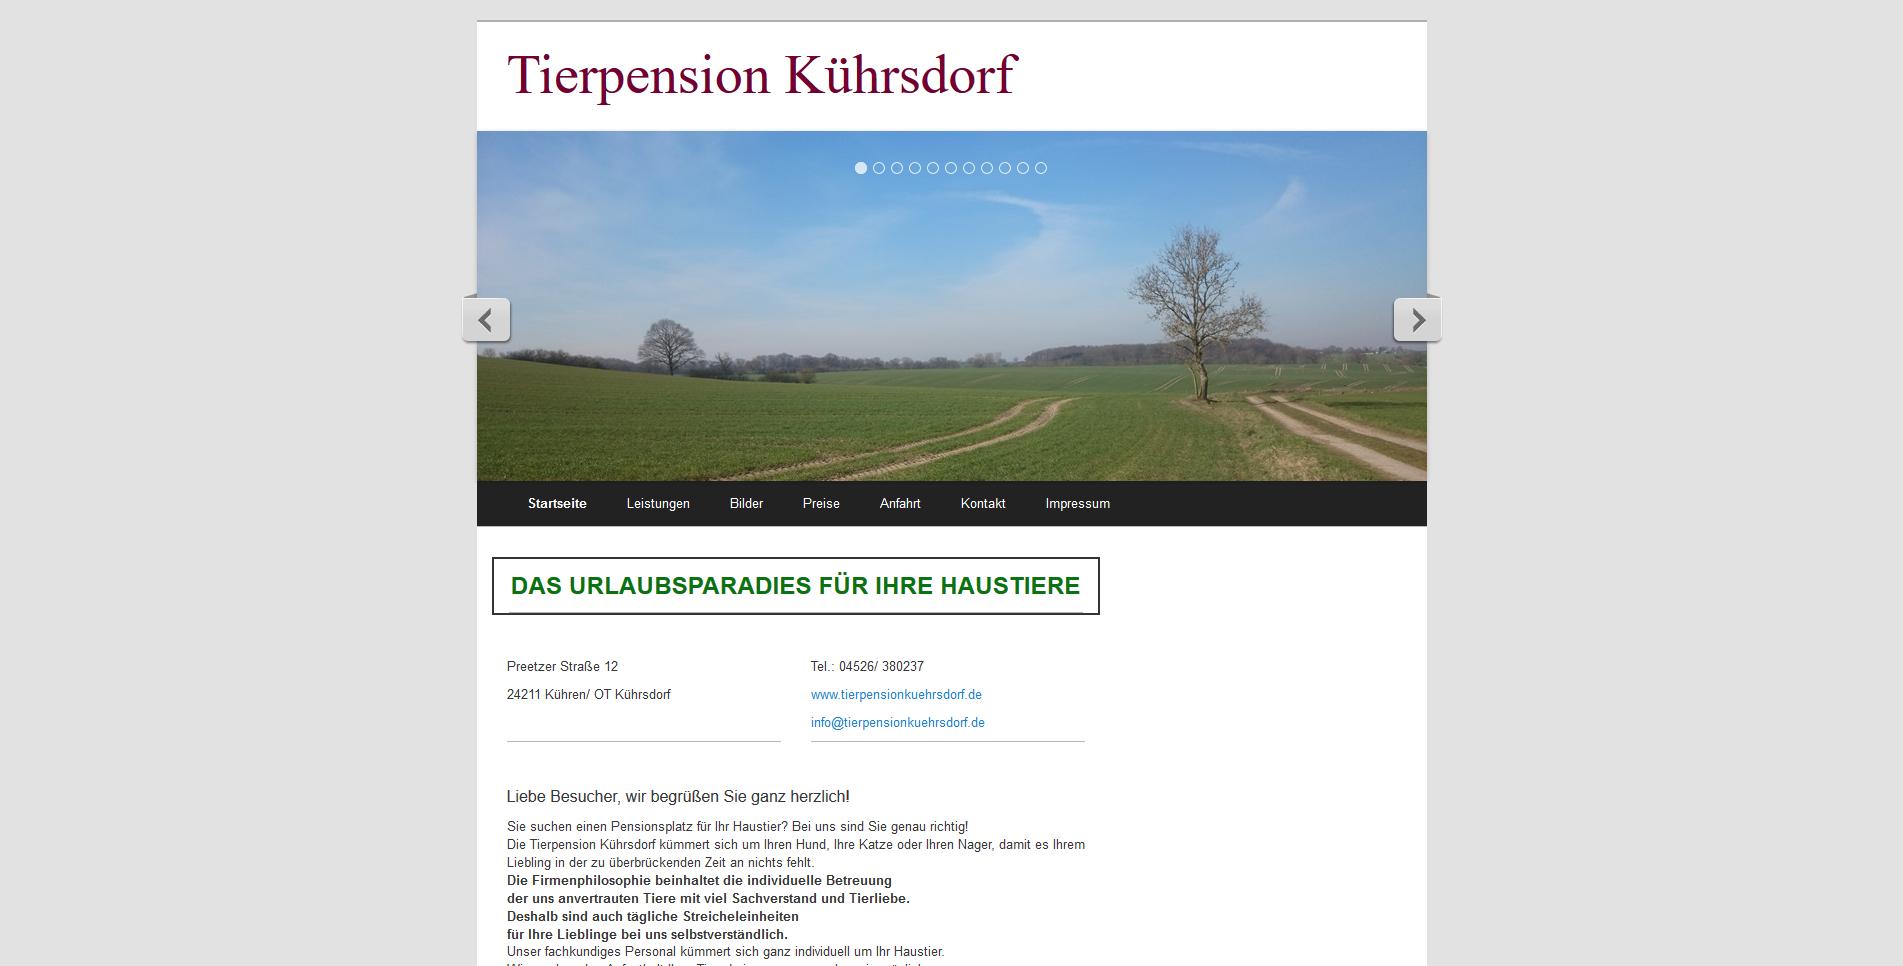 Tierpension Kührsdorf